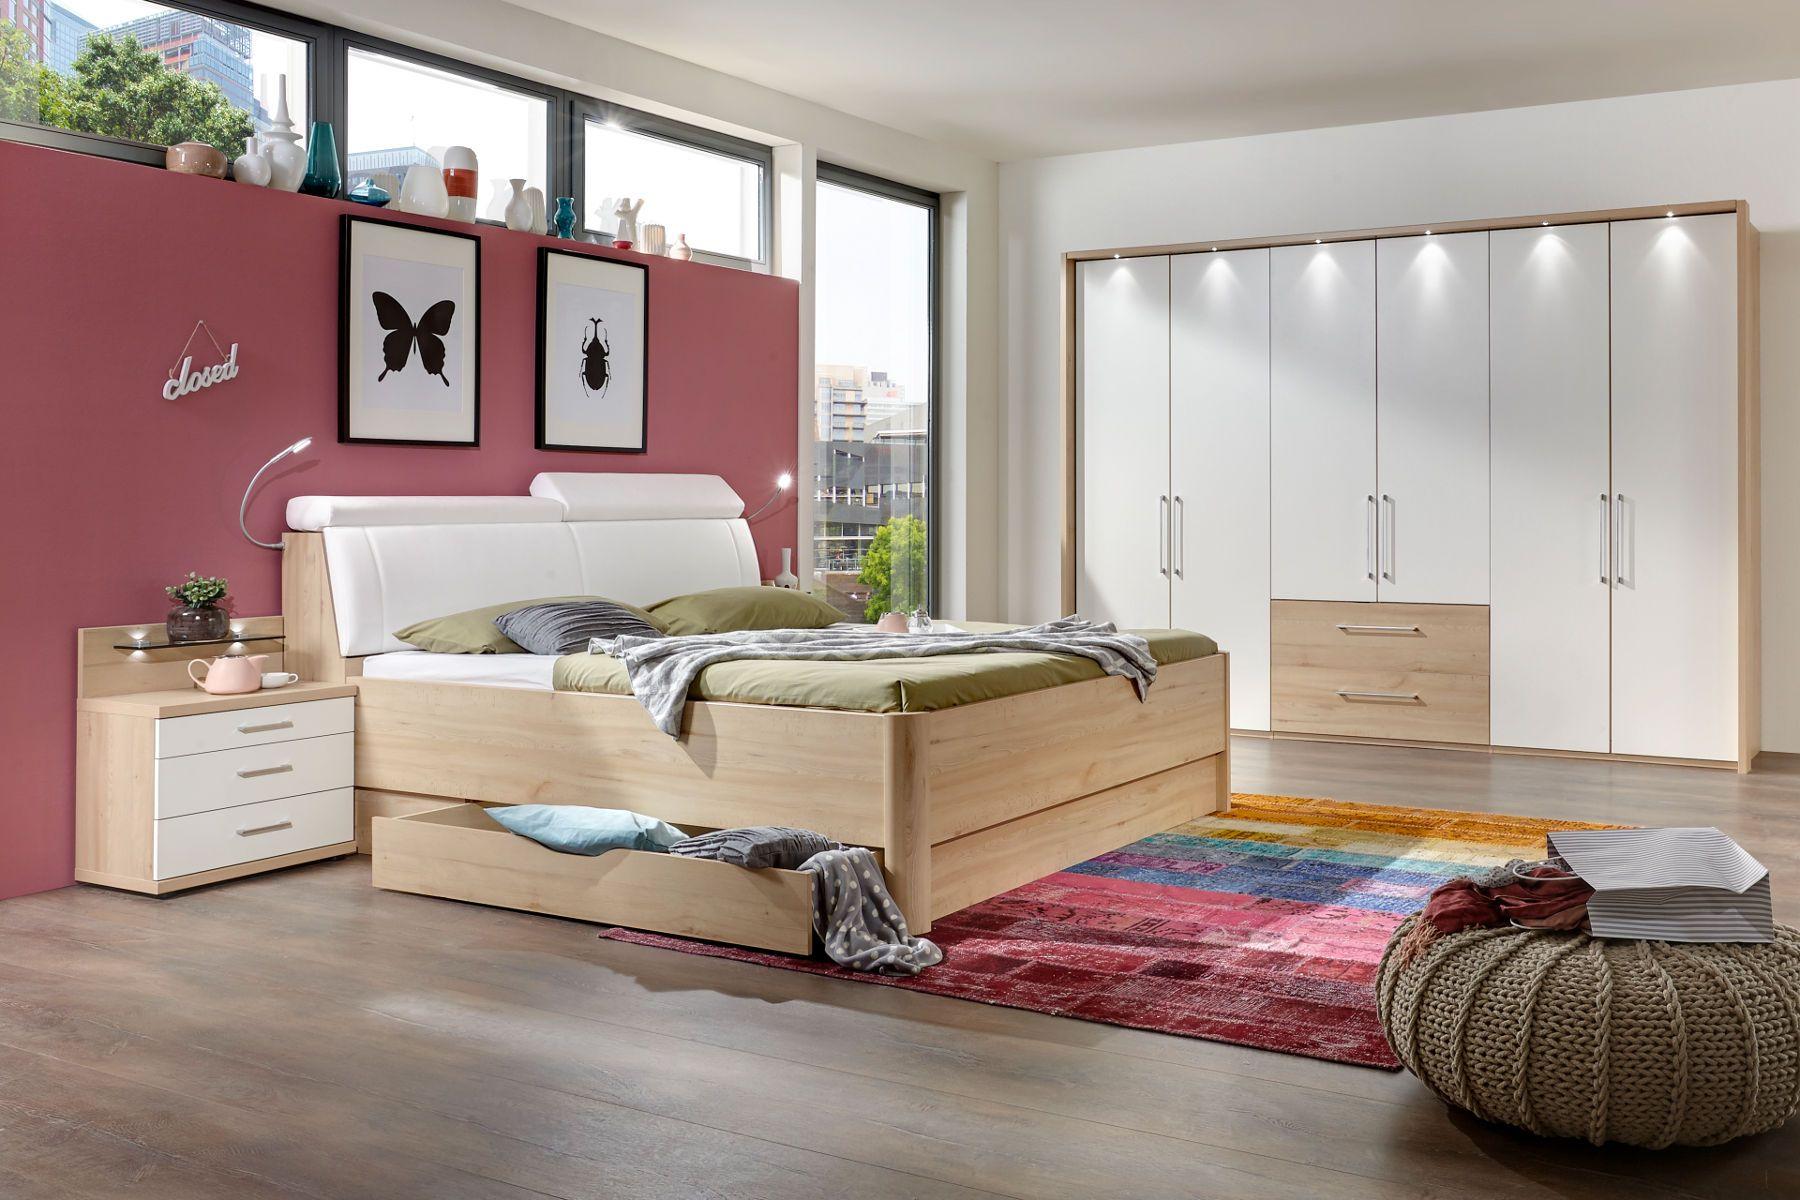 Schlafzimmer Boxspringbett Komplett Jtleigh